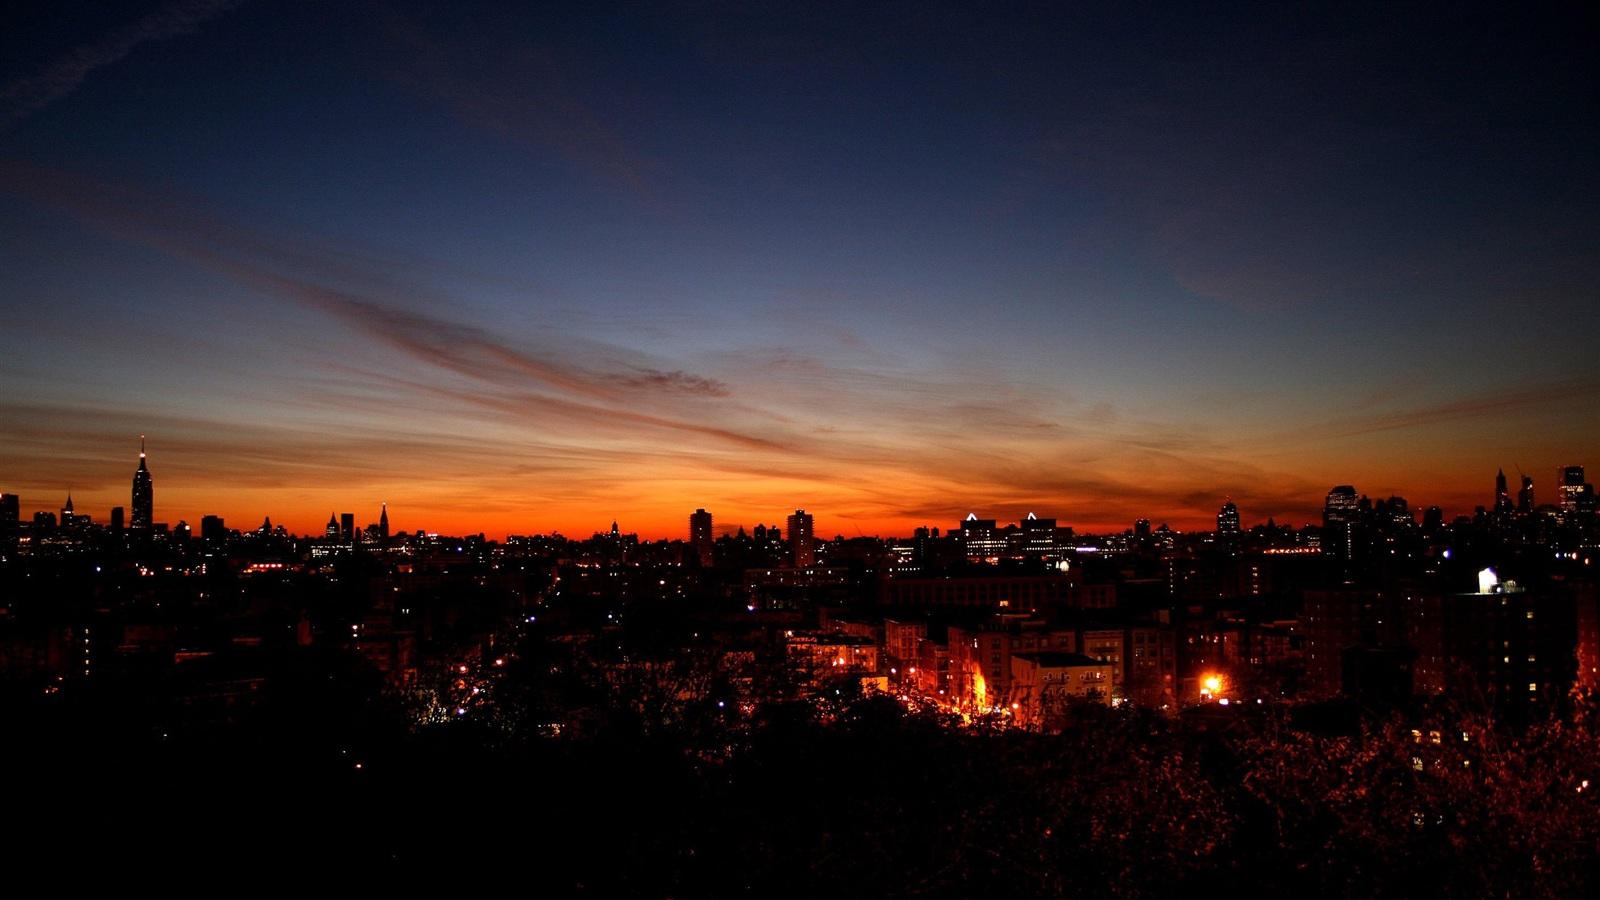 city night sky background - photo #3